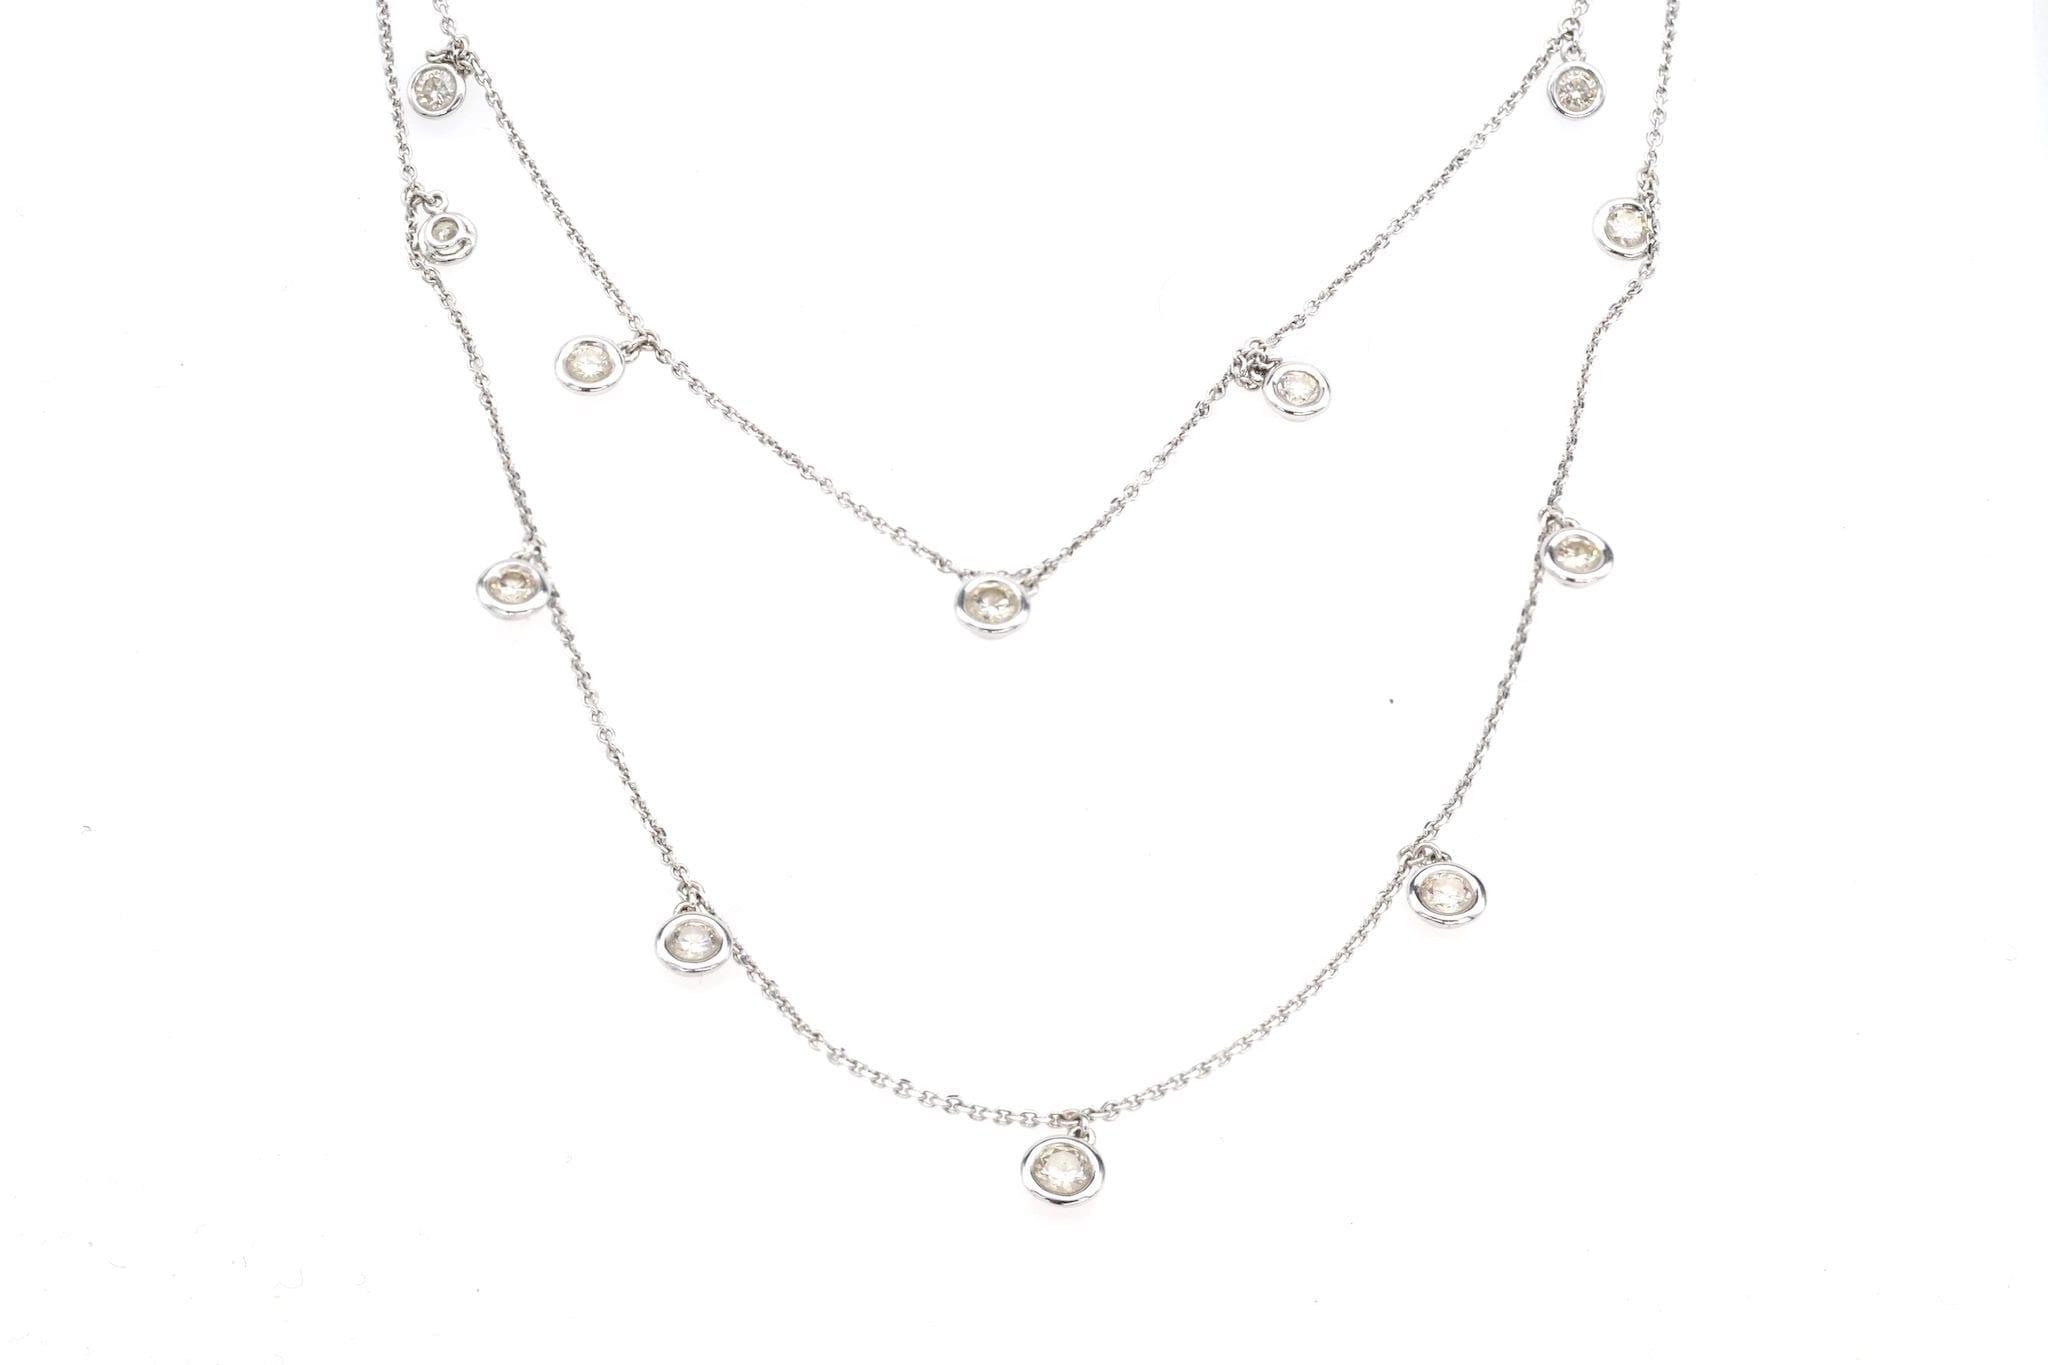 Collier Messika diamants en or blanc 18k